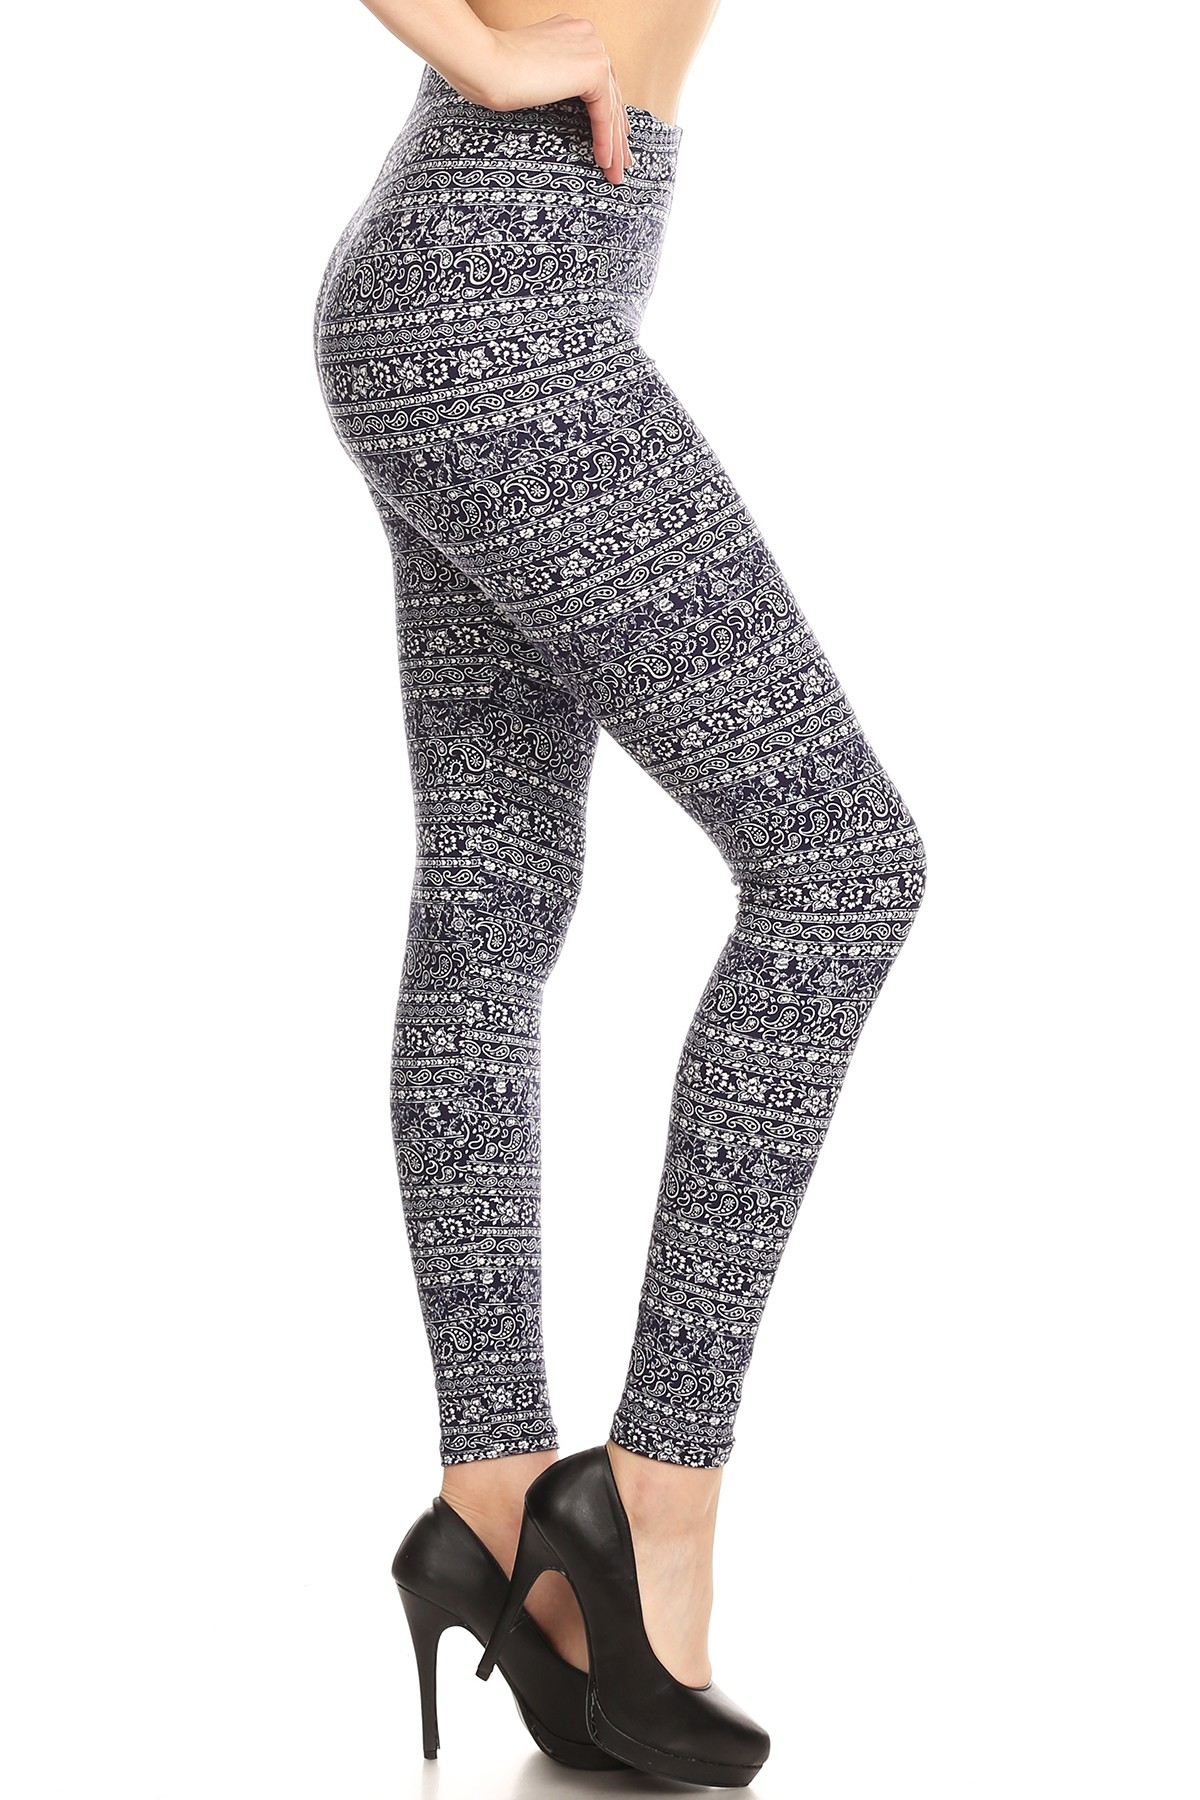 wholesale womens poly brushed printed leggings